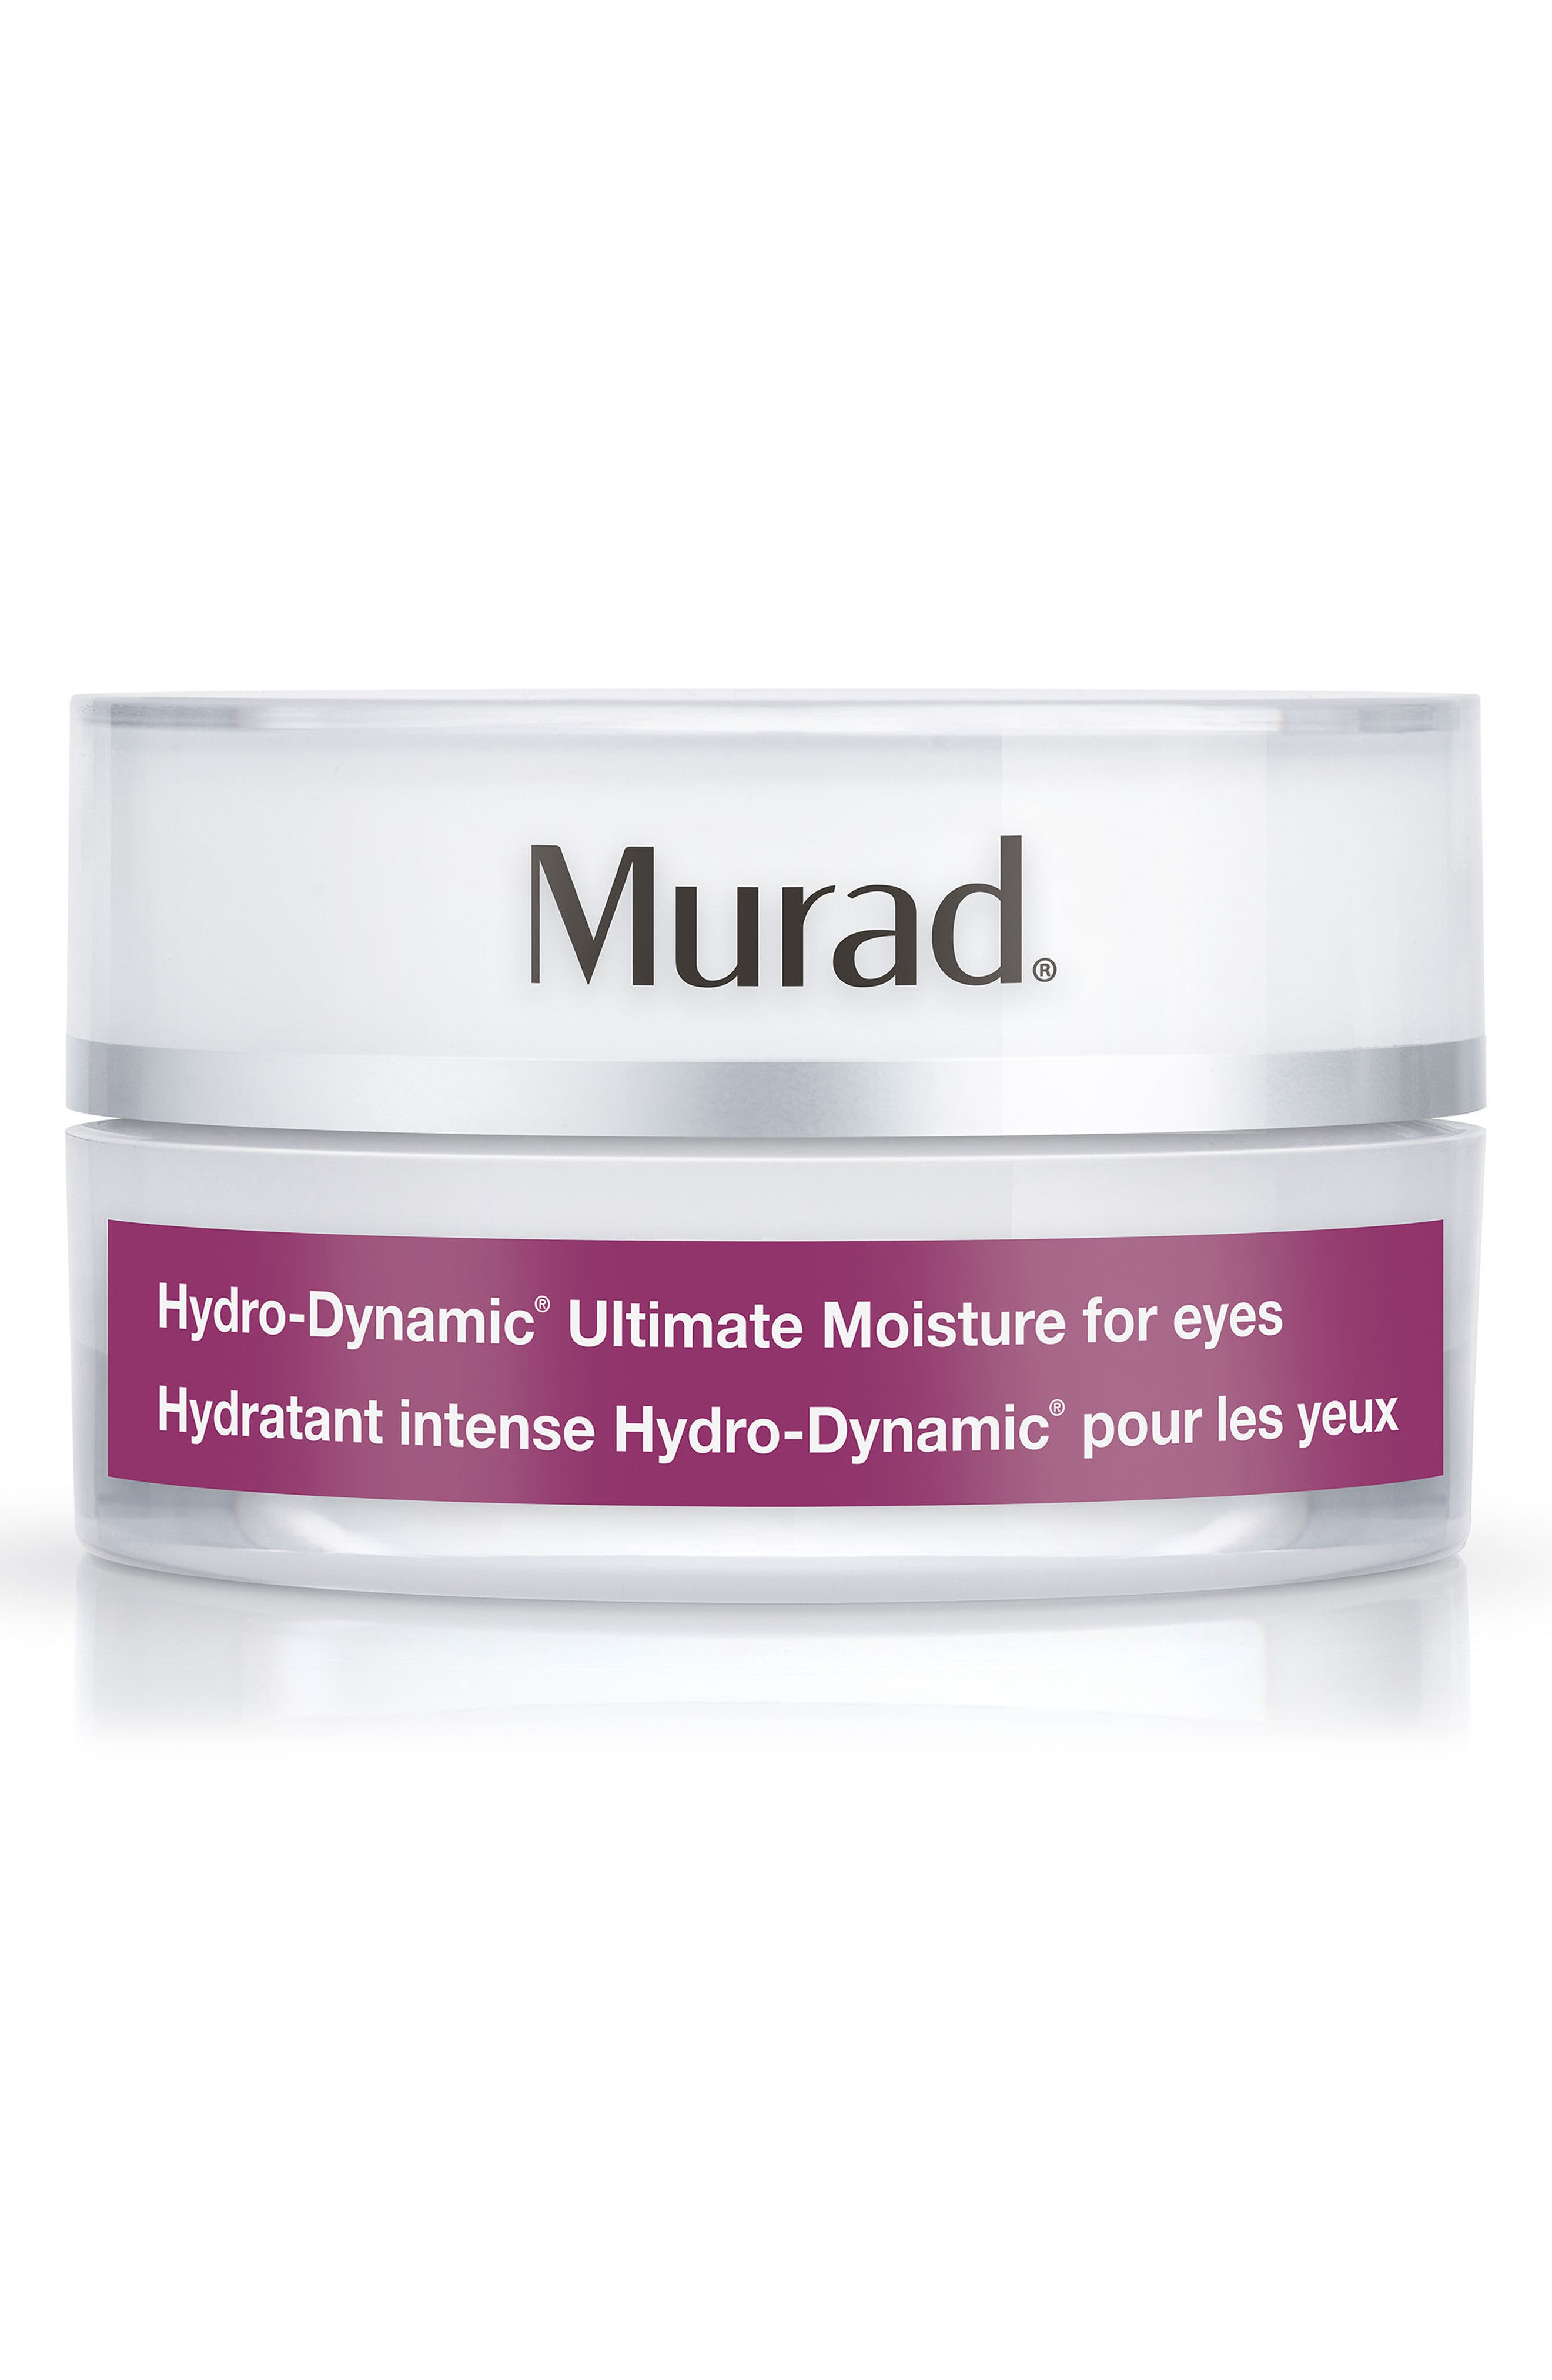 Murad® Hydro-Dynamic® Ultimate Moisture for Eyes